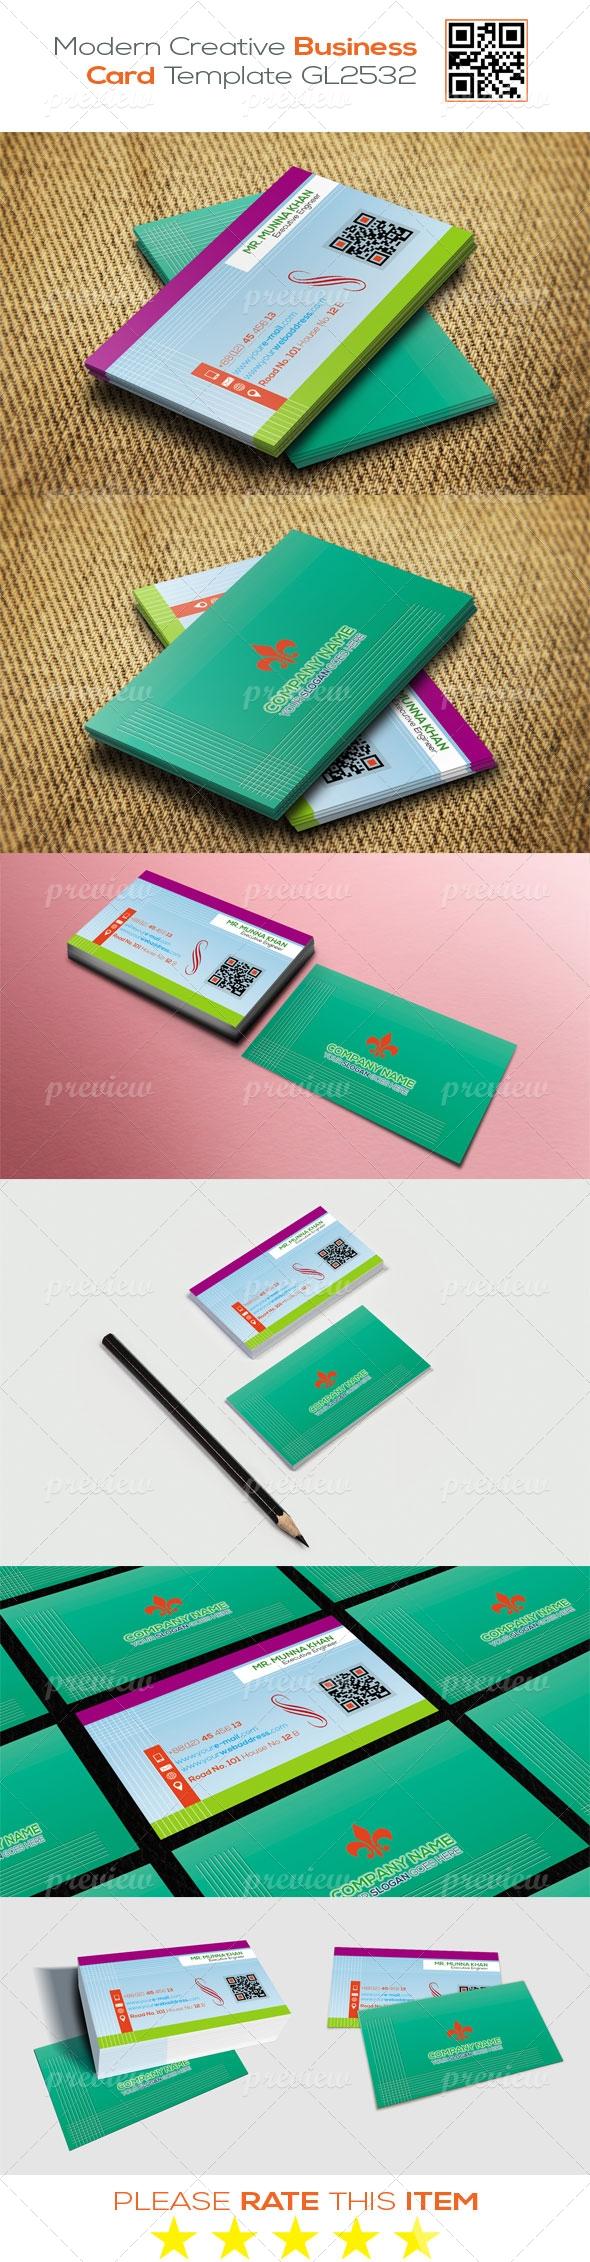 Modern Creative Business Card Template GL2532